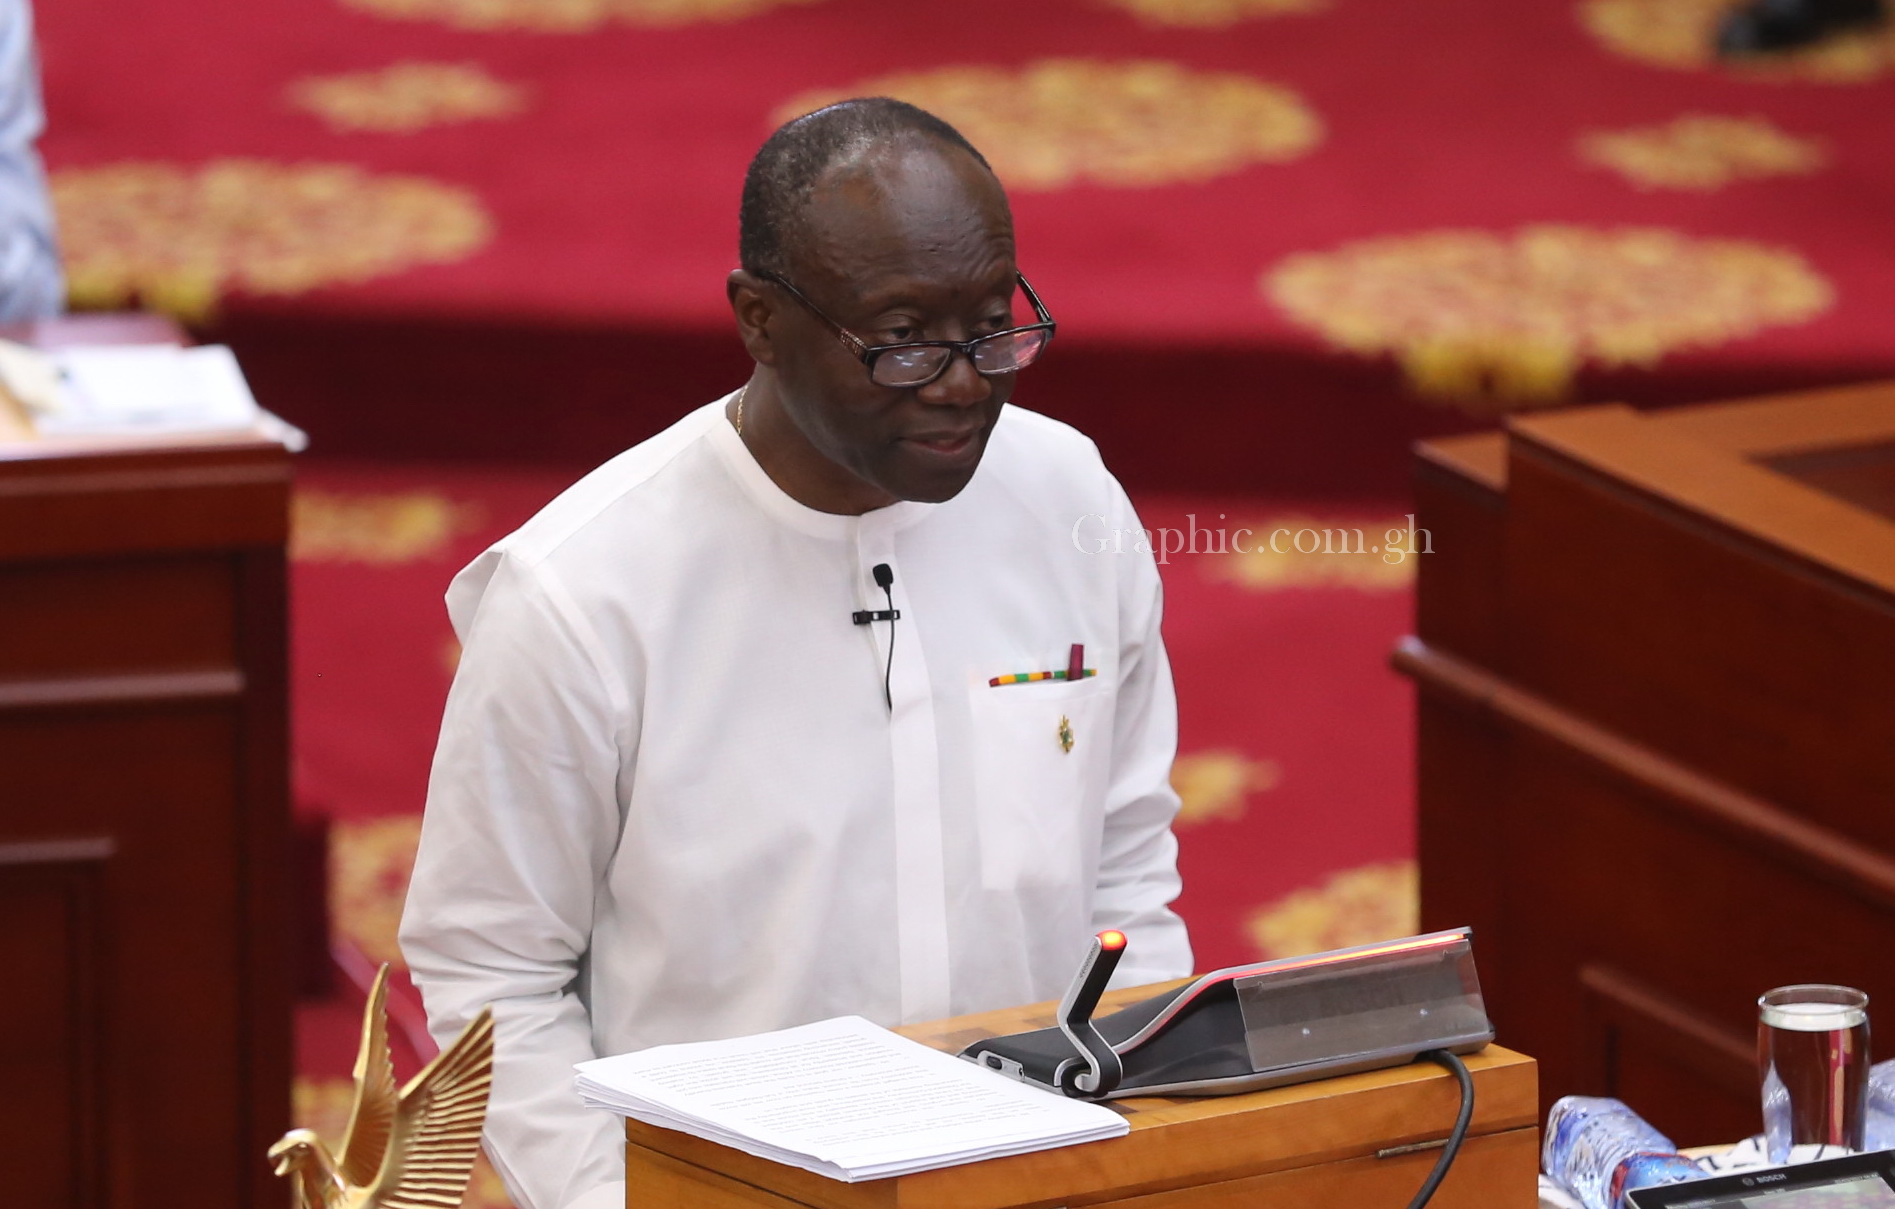 Kenneth Ofori-Atta, Ghana's finance minister